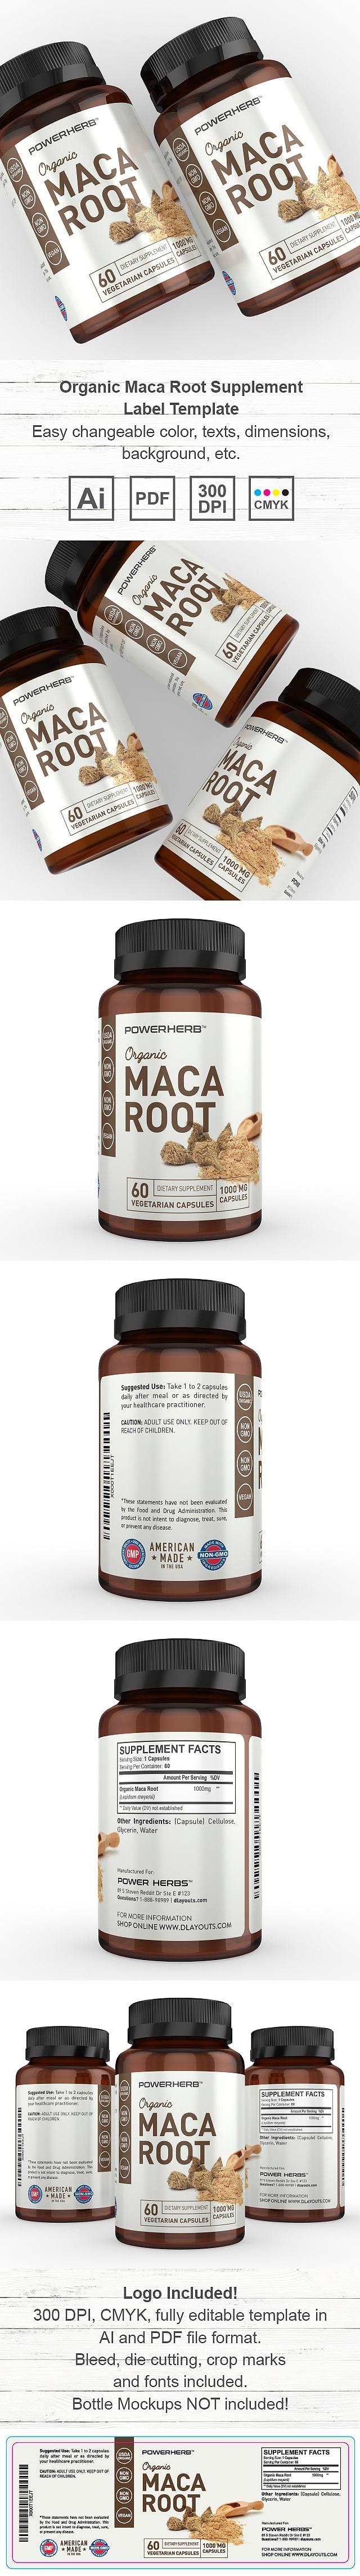 Organic Maca Root Supplement Label Template